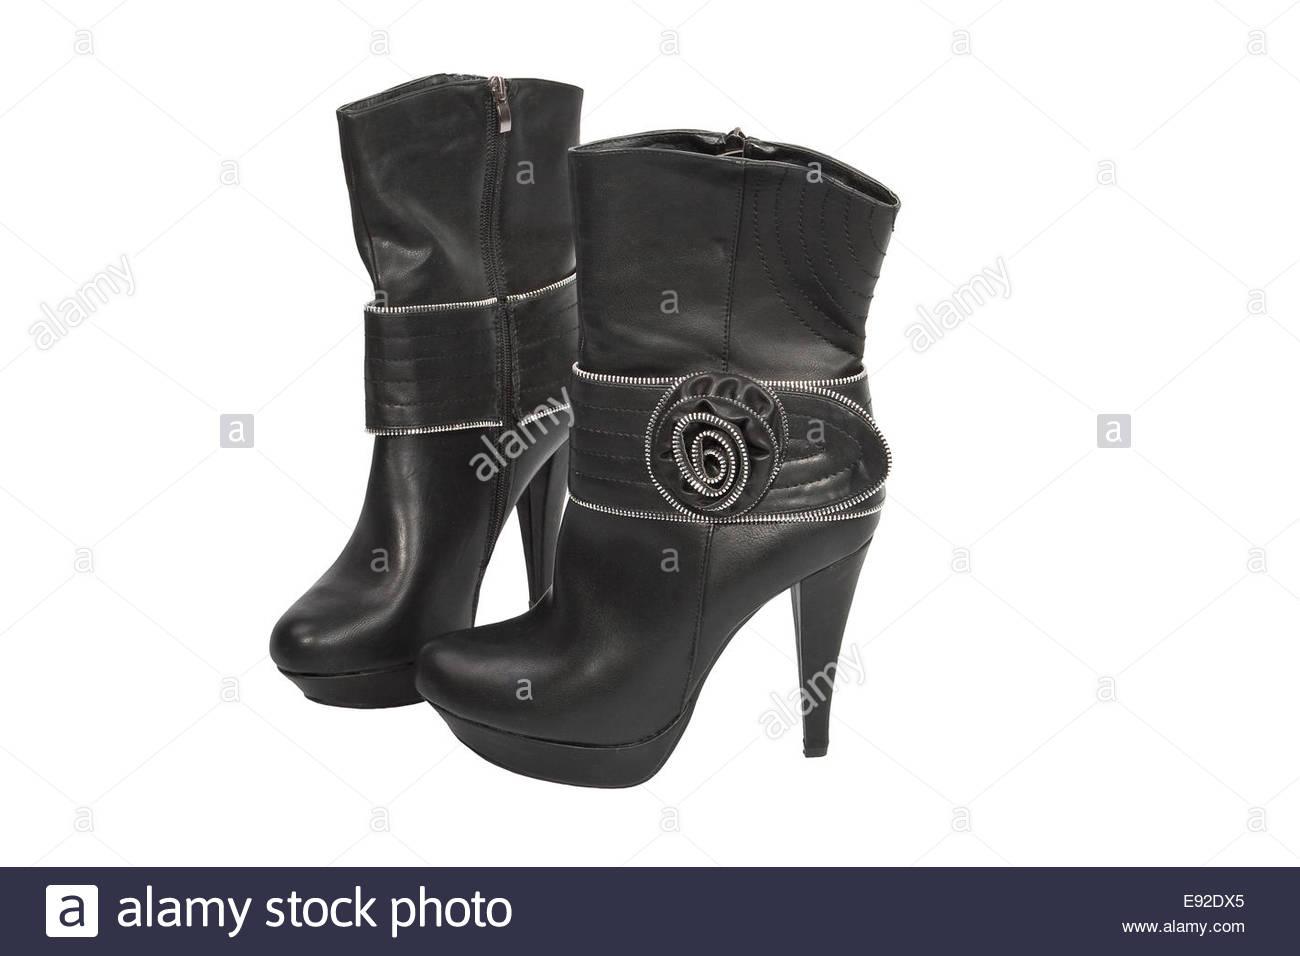 ed909810974 Platform Boots Stock Photos & Platform Boots Stock Images - Alamy